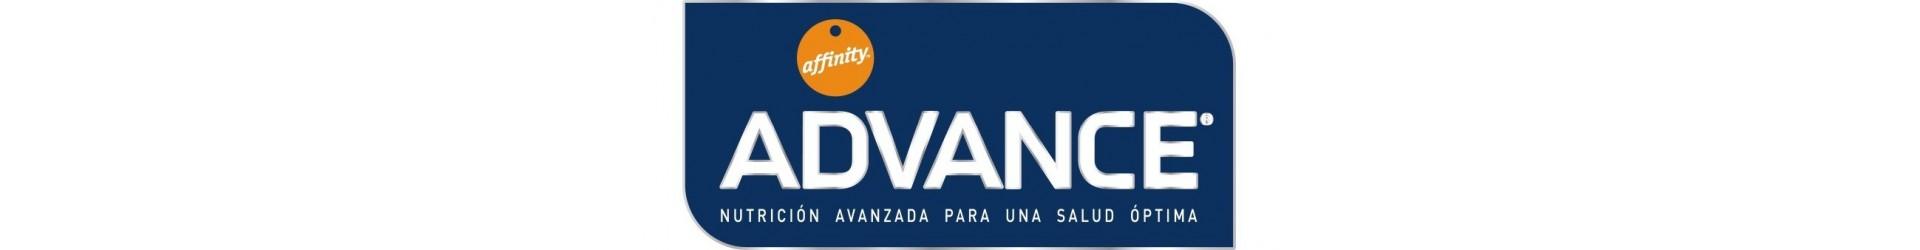 Advance